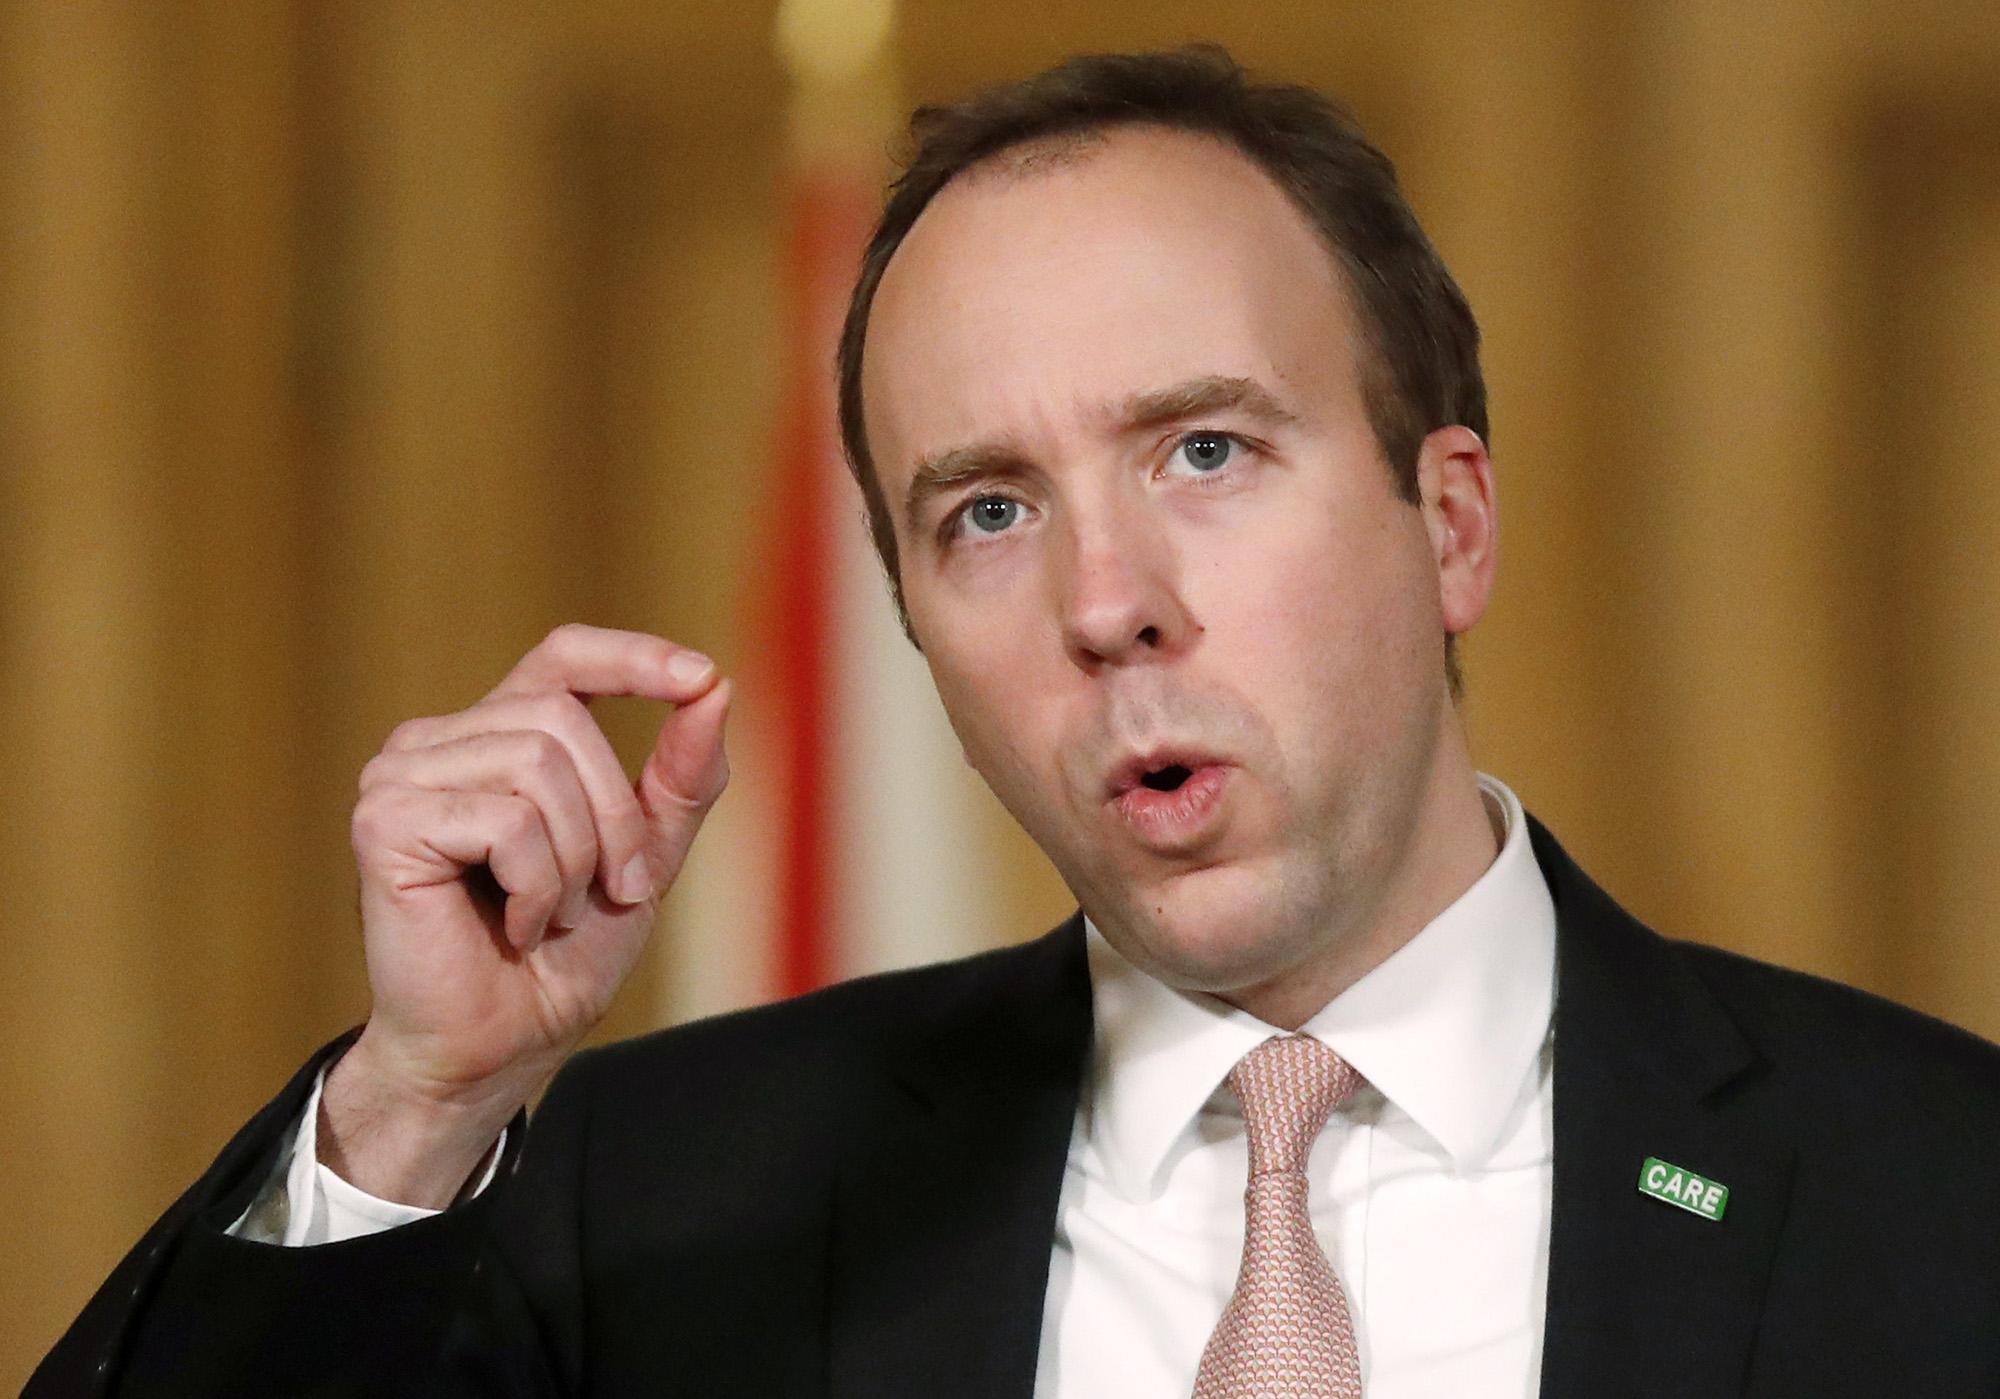 British Health Secretary Matt Hancock speaks at a coronavirus news conference at 10 Downing Street on January 11, in London, England.